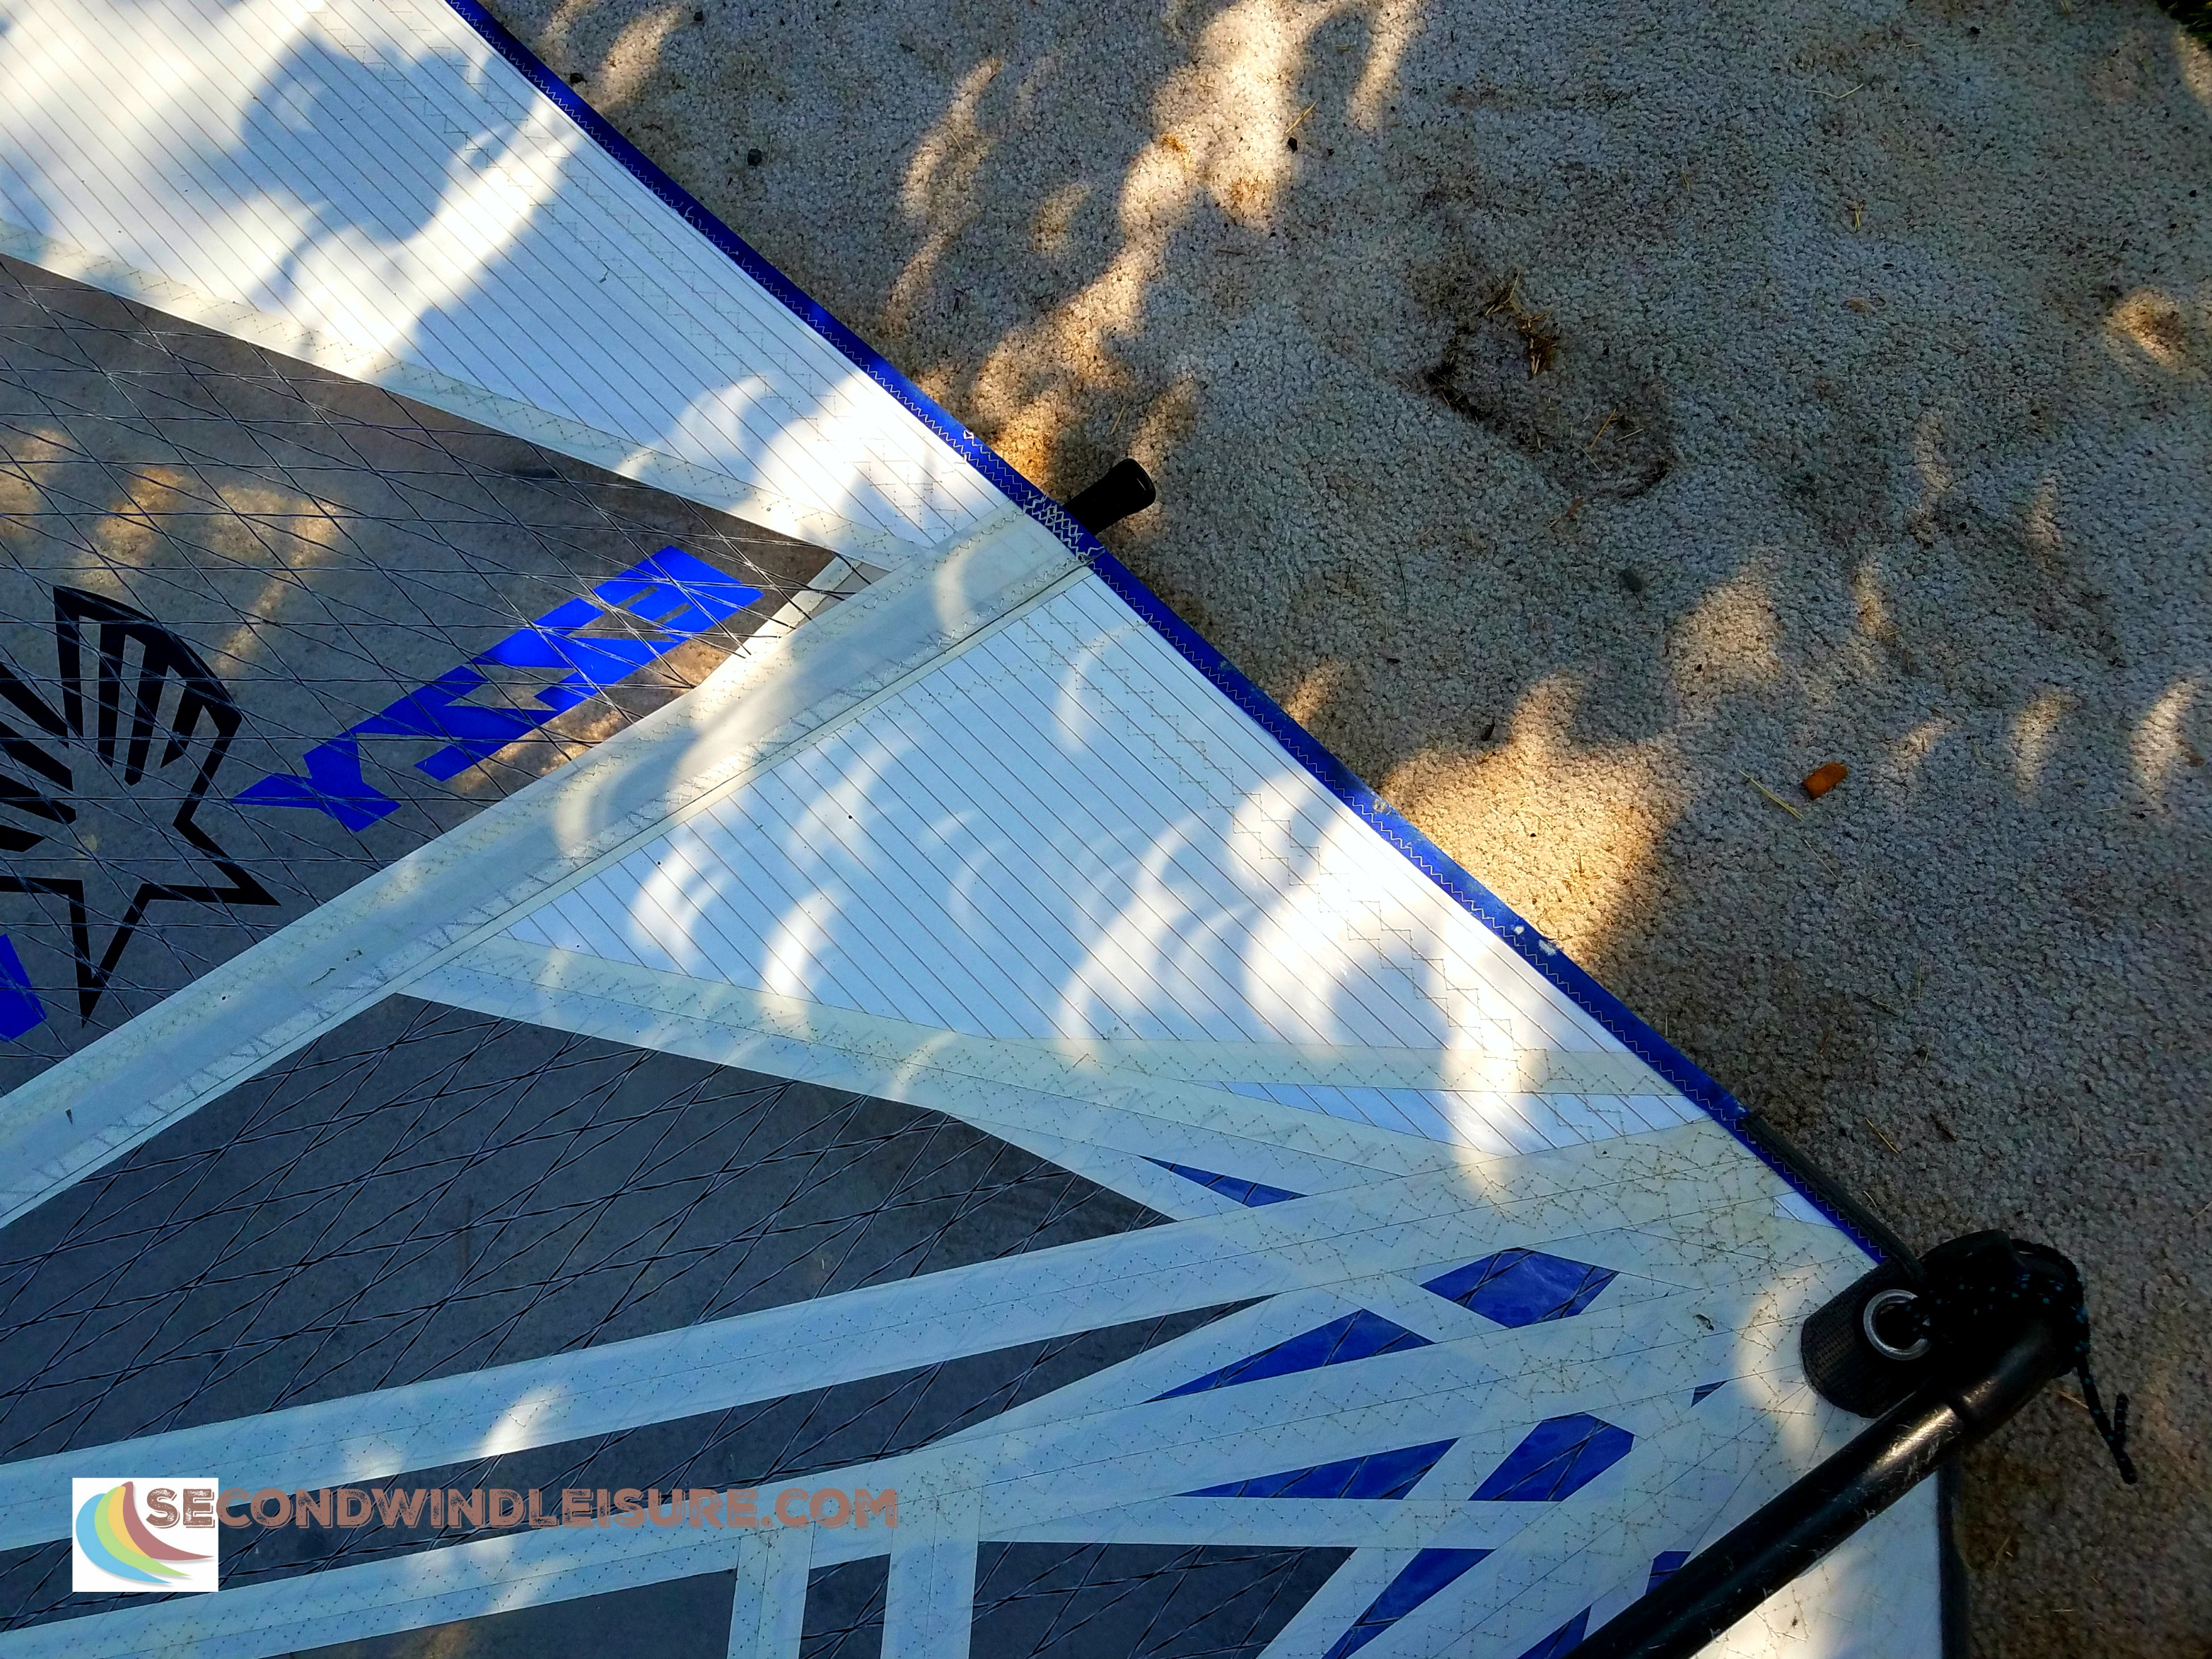 Partial solar eclipse leaves wondrous crescent shadows on a windsurf sail